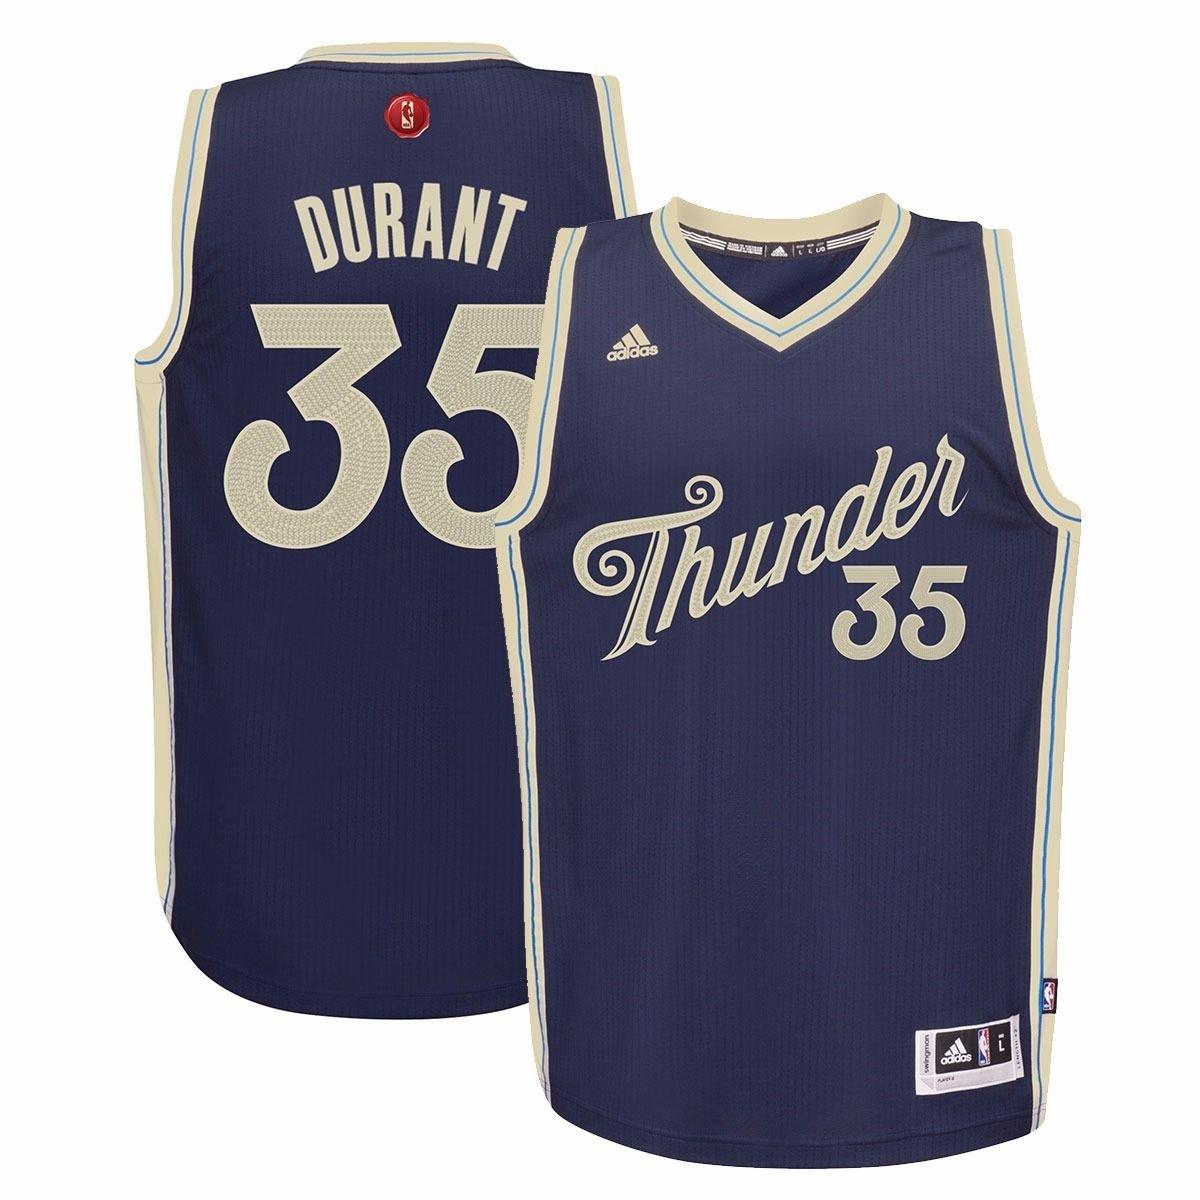 Amazon.com: adidas Russell Westbrook #0 Oklahoma City Thunder NBA ...